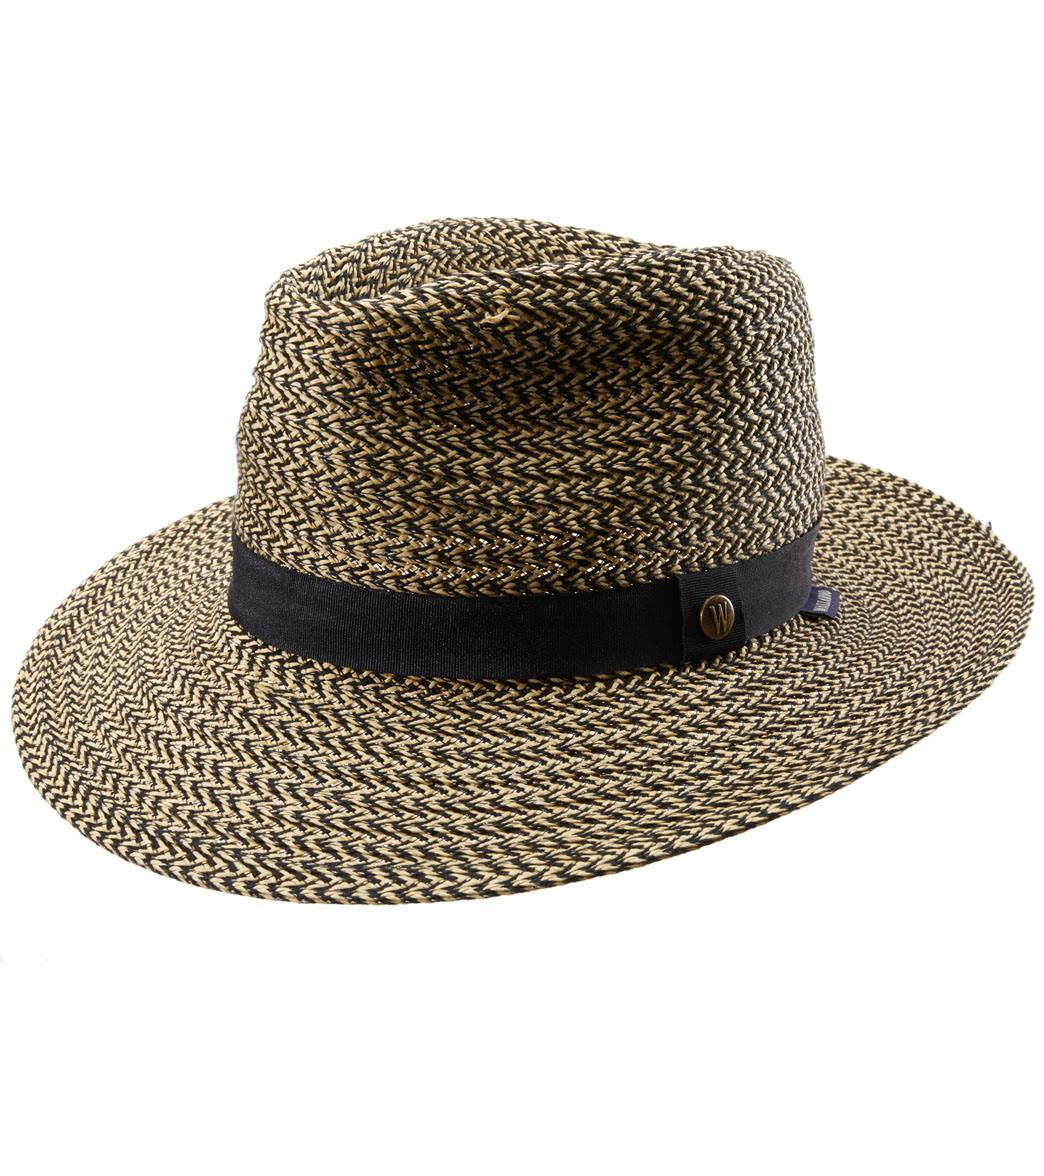 Wallaroo Men s Palmer Sun Hat at SwimOutlet.com 6b1930dc57f